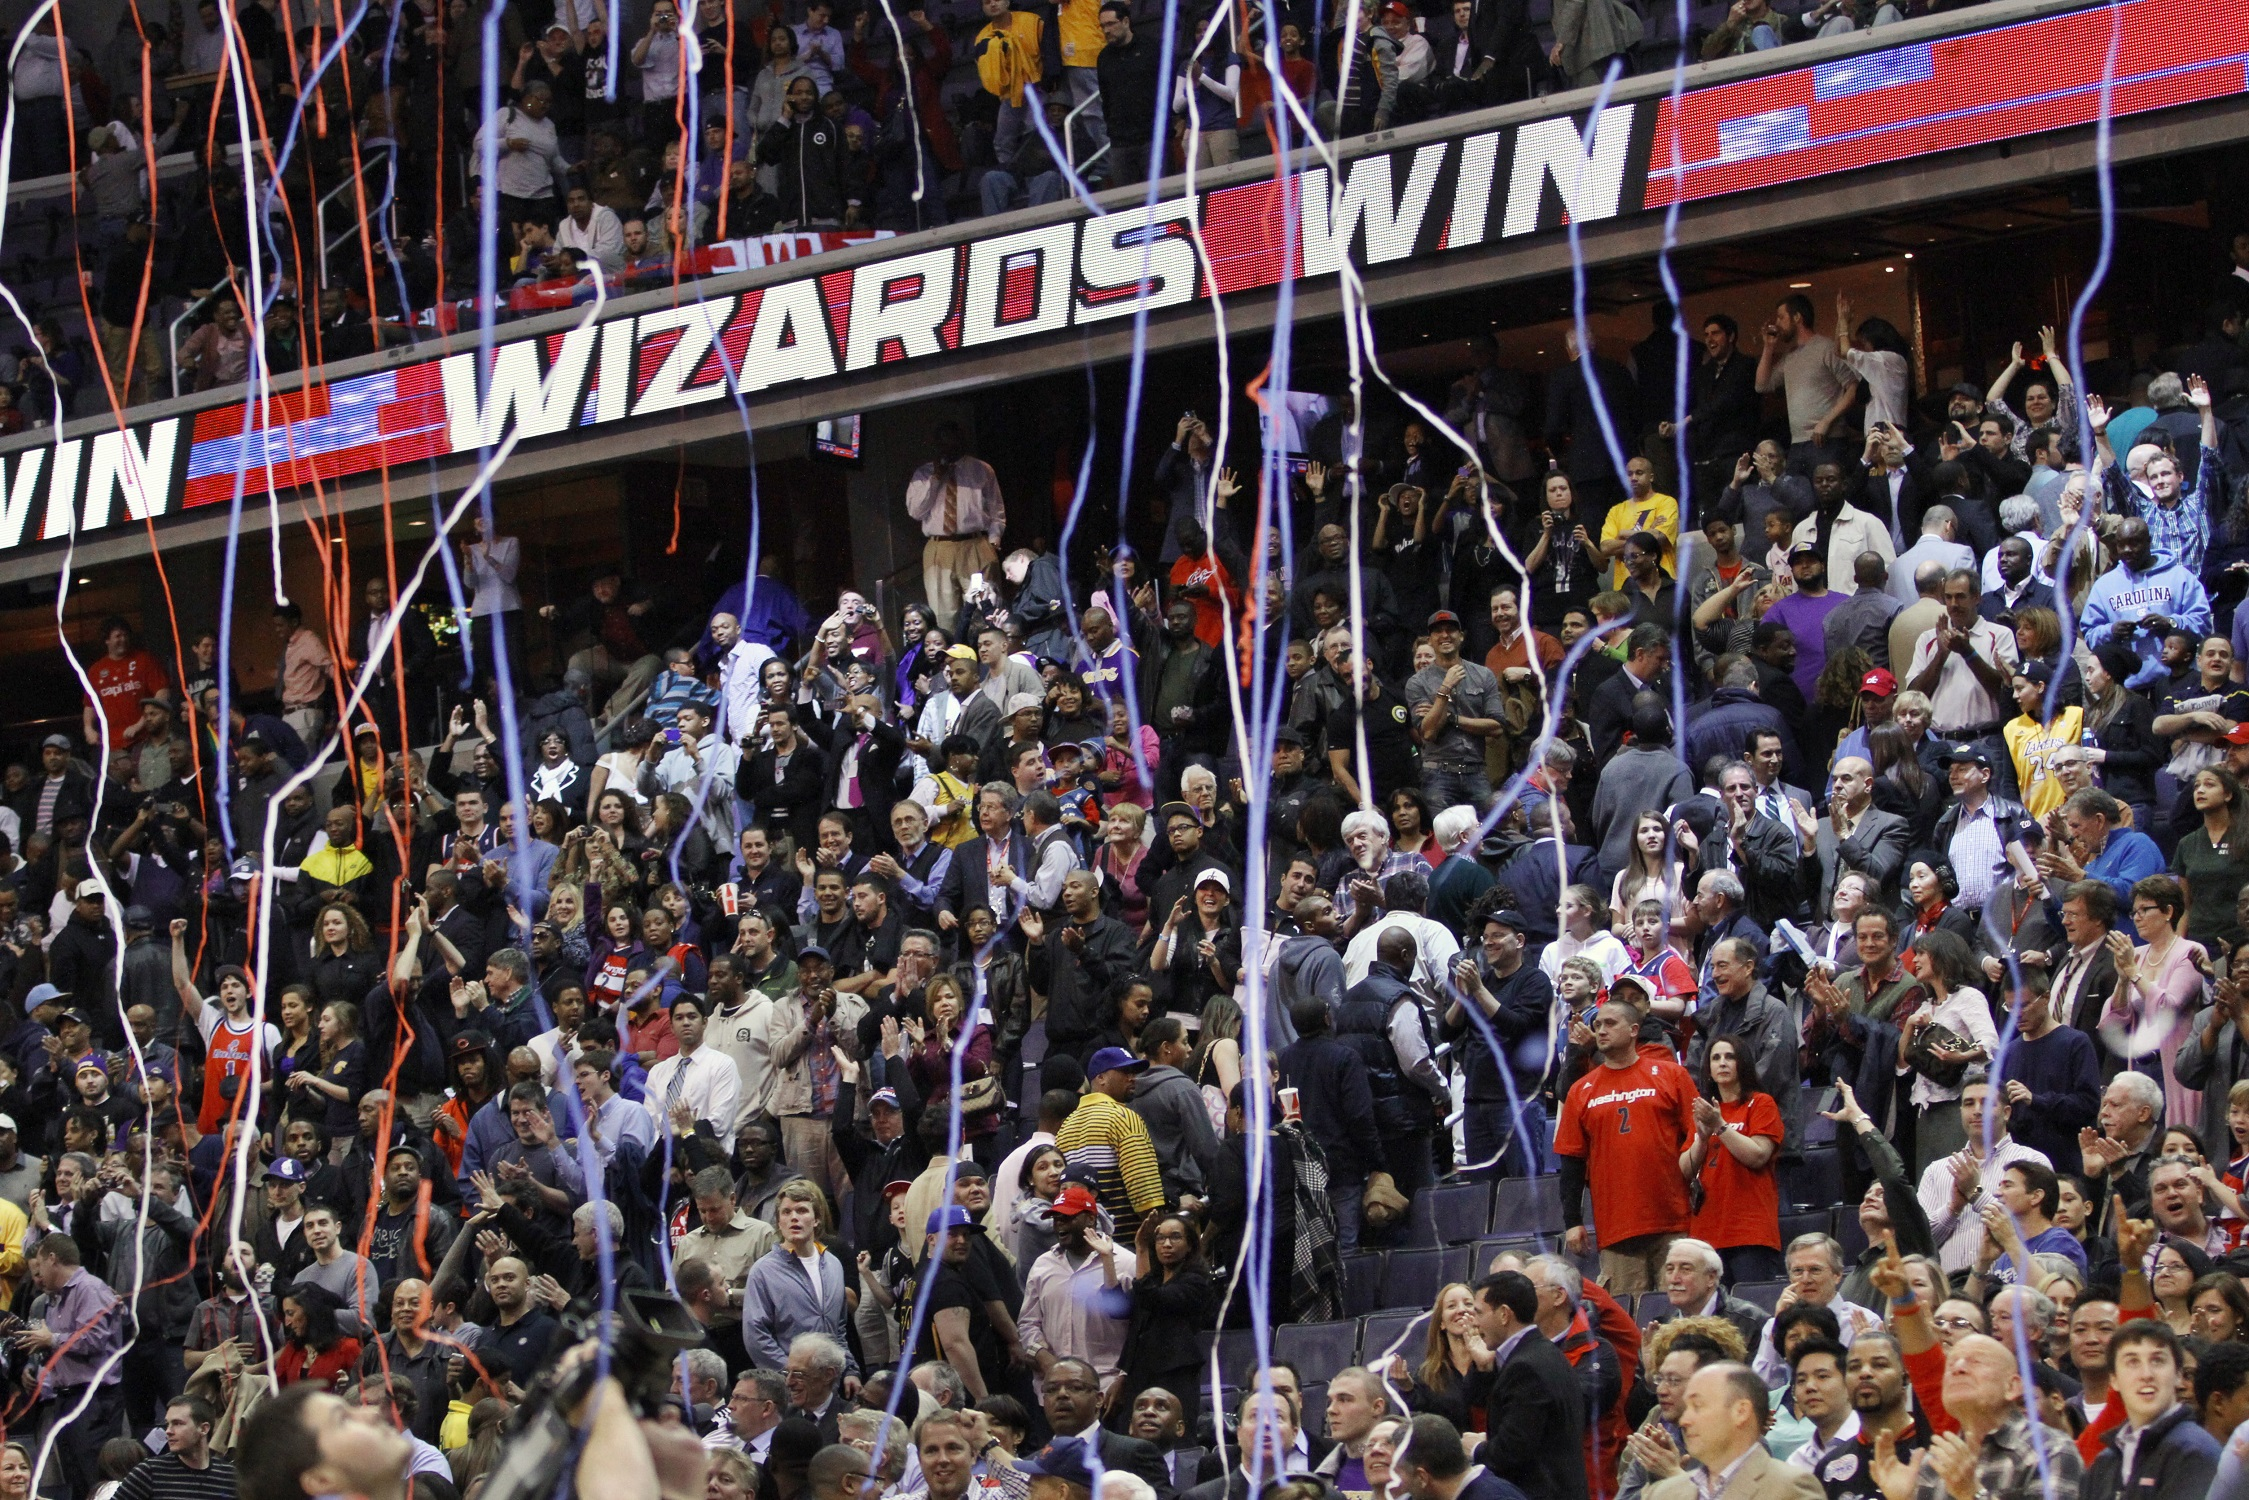 Verizon Center ranks No. 9 nationwide for ticket sales